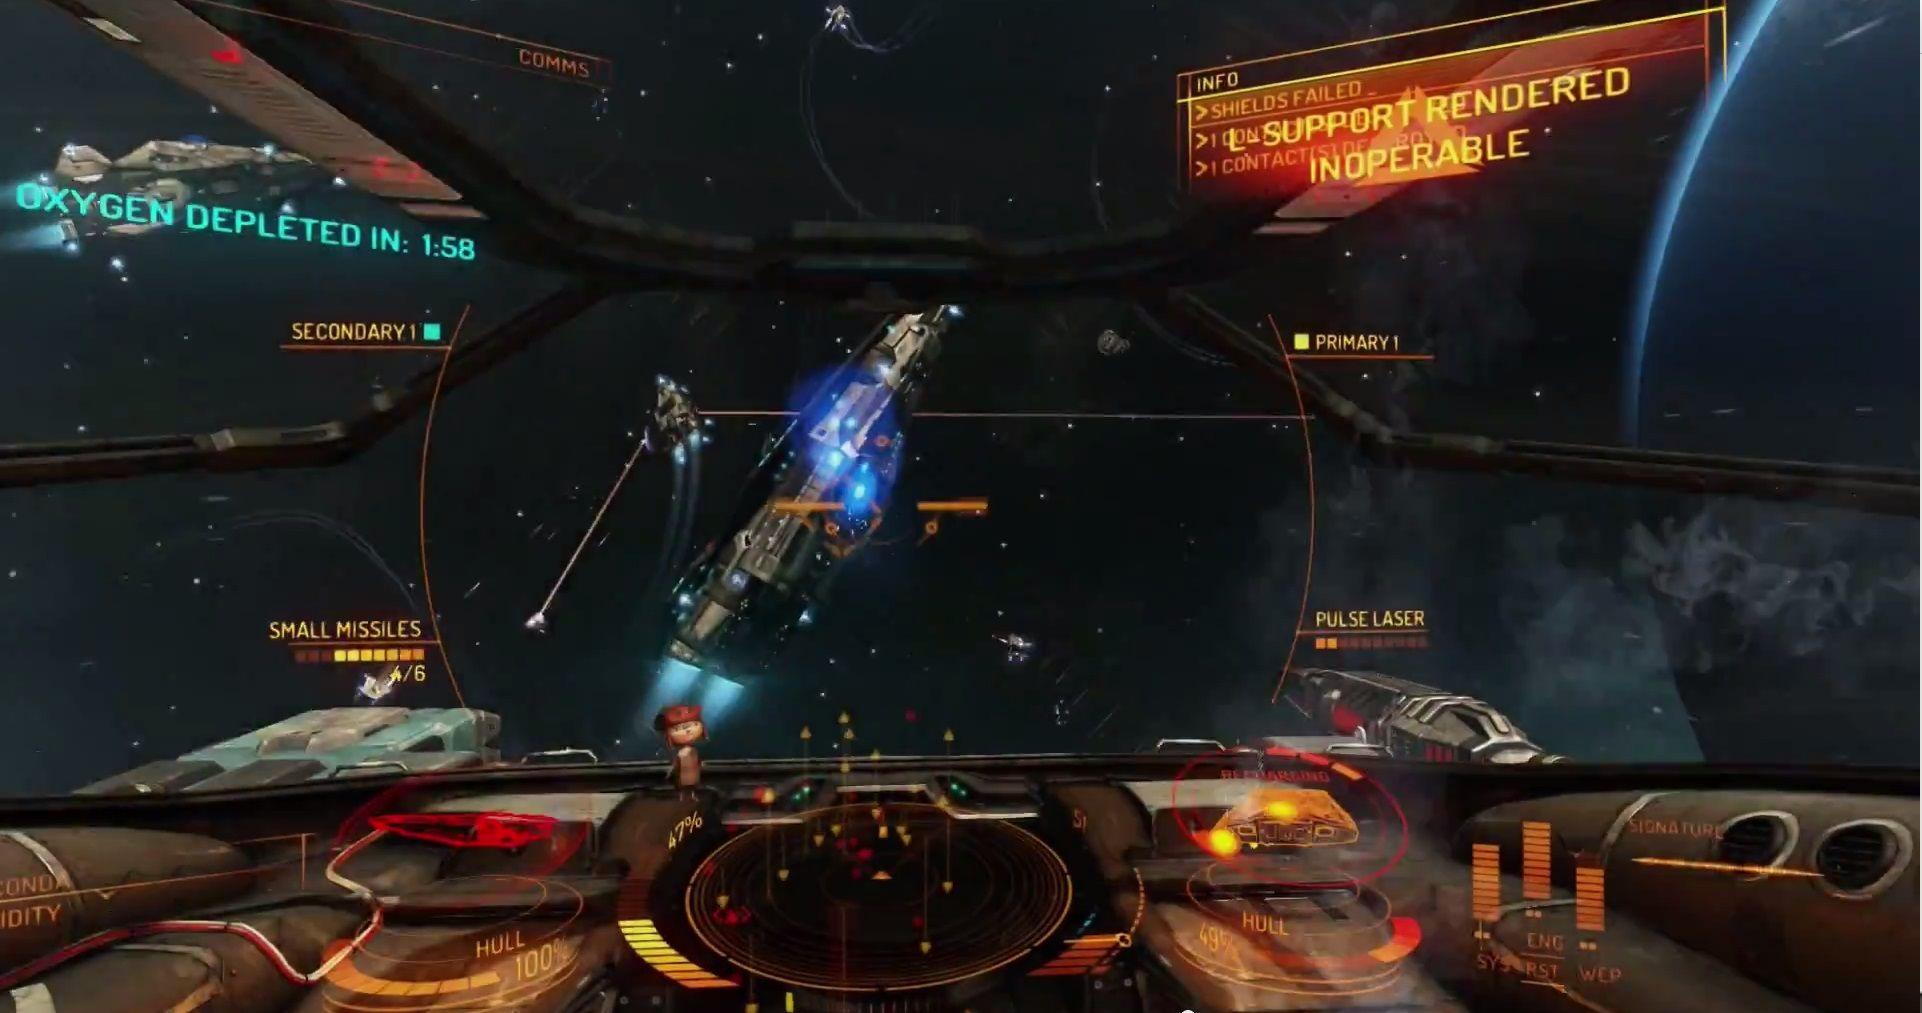 Elite Dangerous Cockpit Google Search Pc Games Download Download Games Free Pc Games